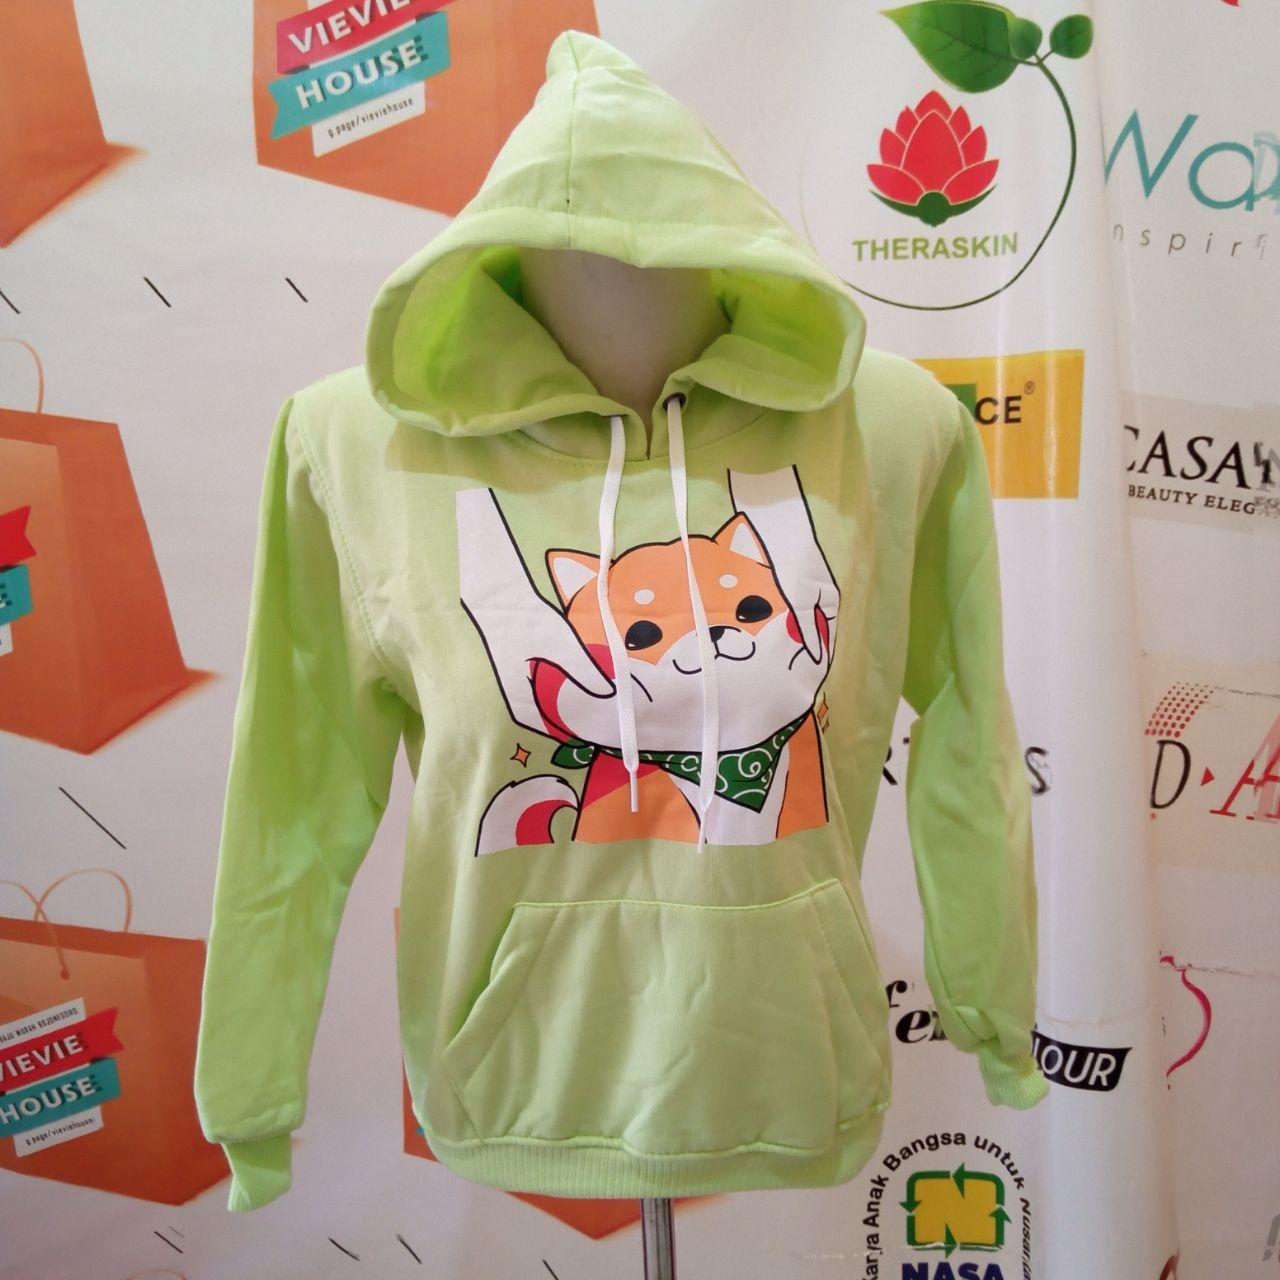 ini adalah Jaket Anak Sibu Hijau, size: LD +- 78cm, material: Fleece, color: Green, brand: JaketAnakIndonesia, age_group: kids, gender: unisex